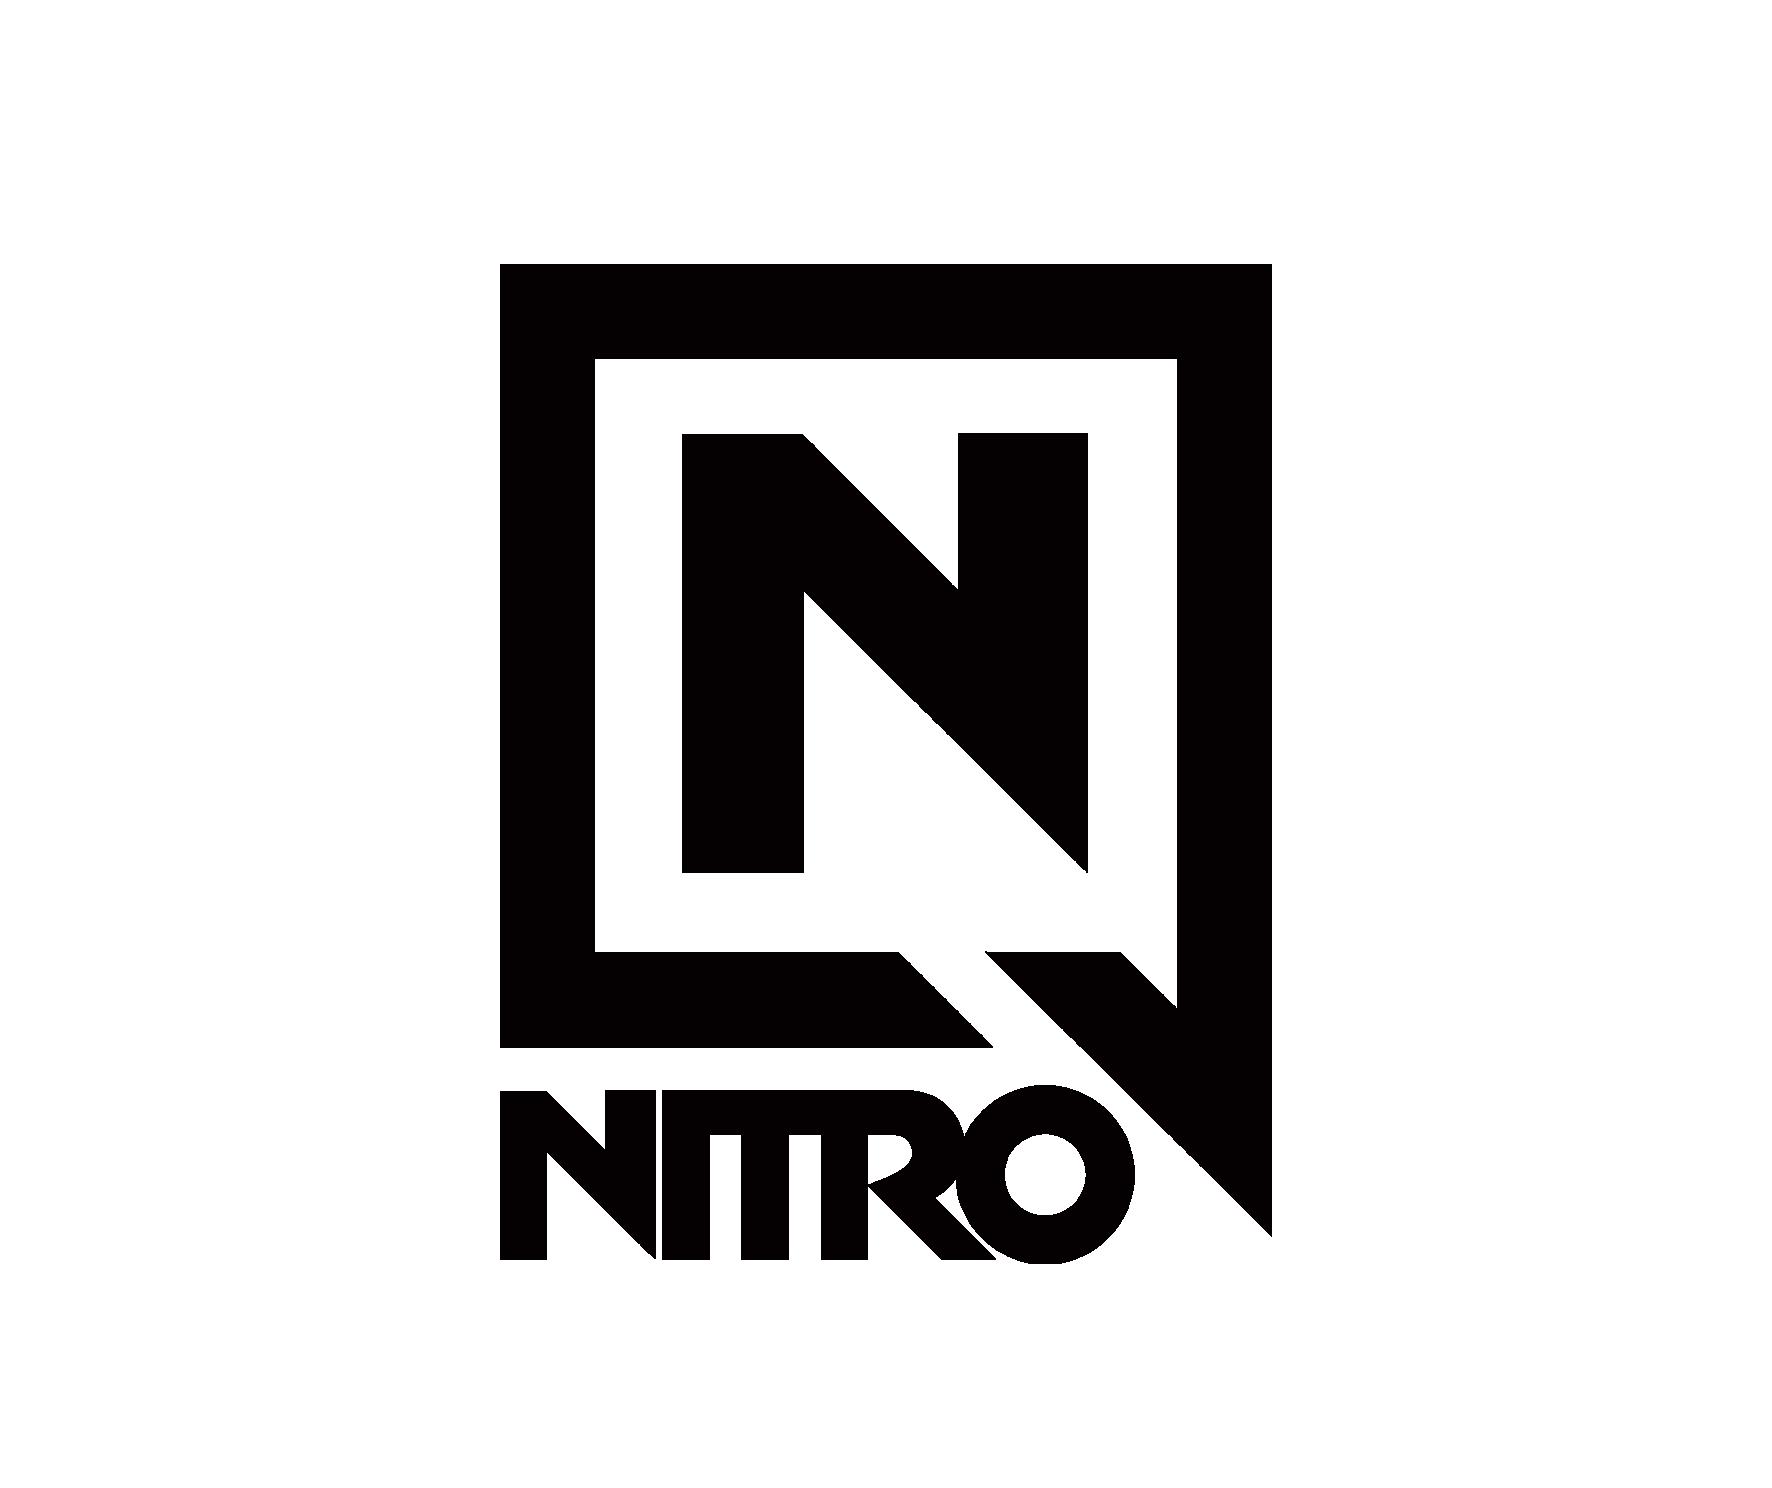 Nitro